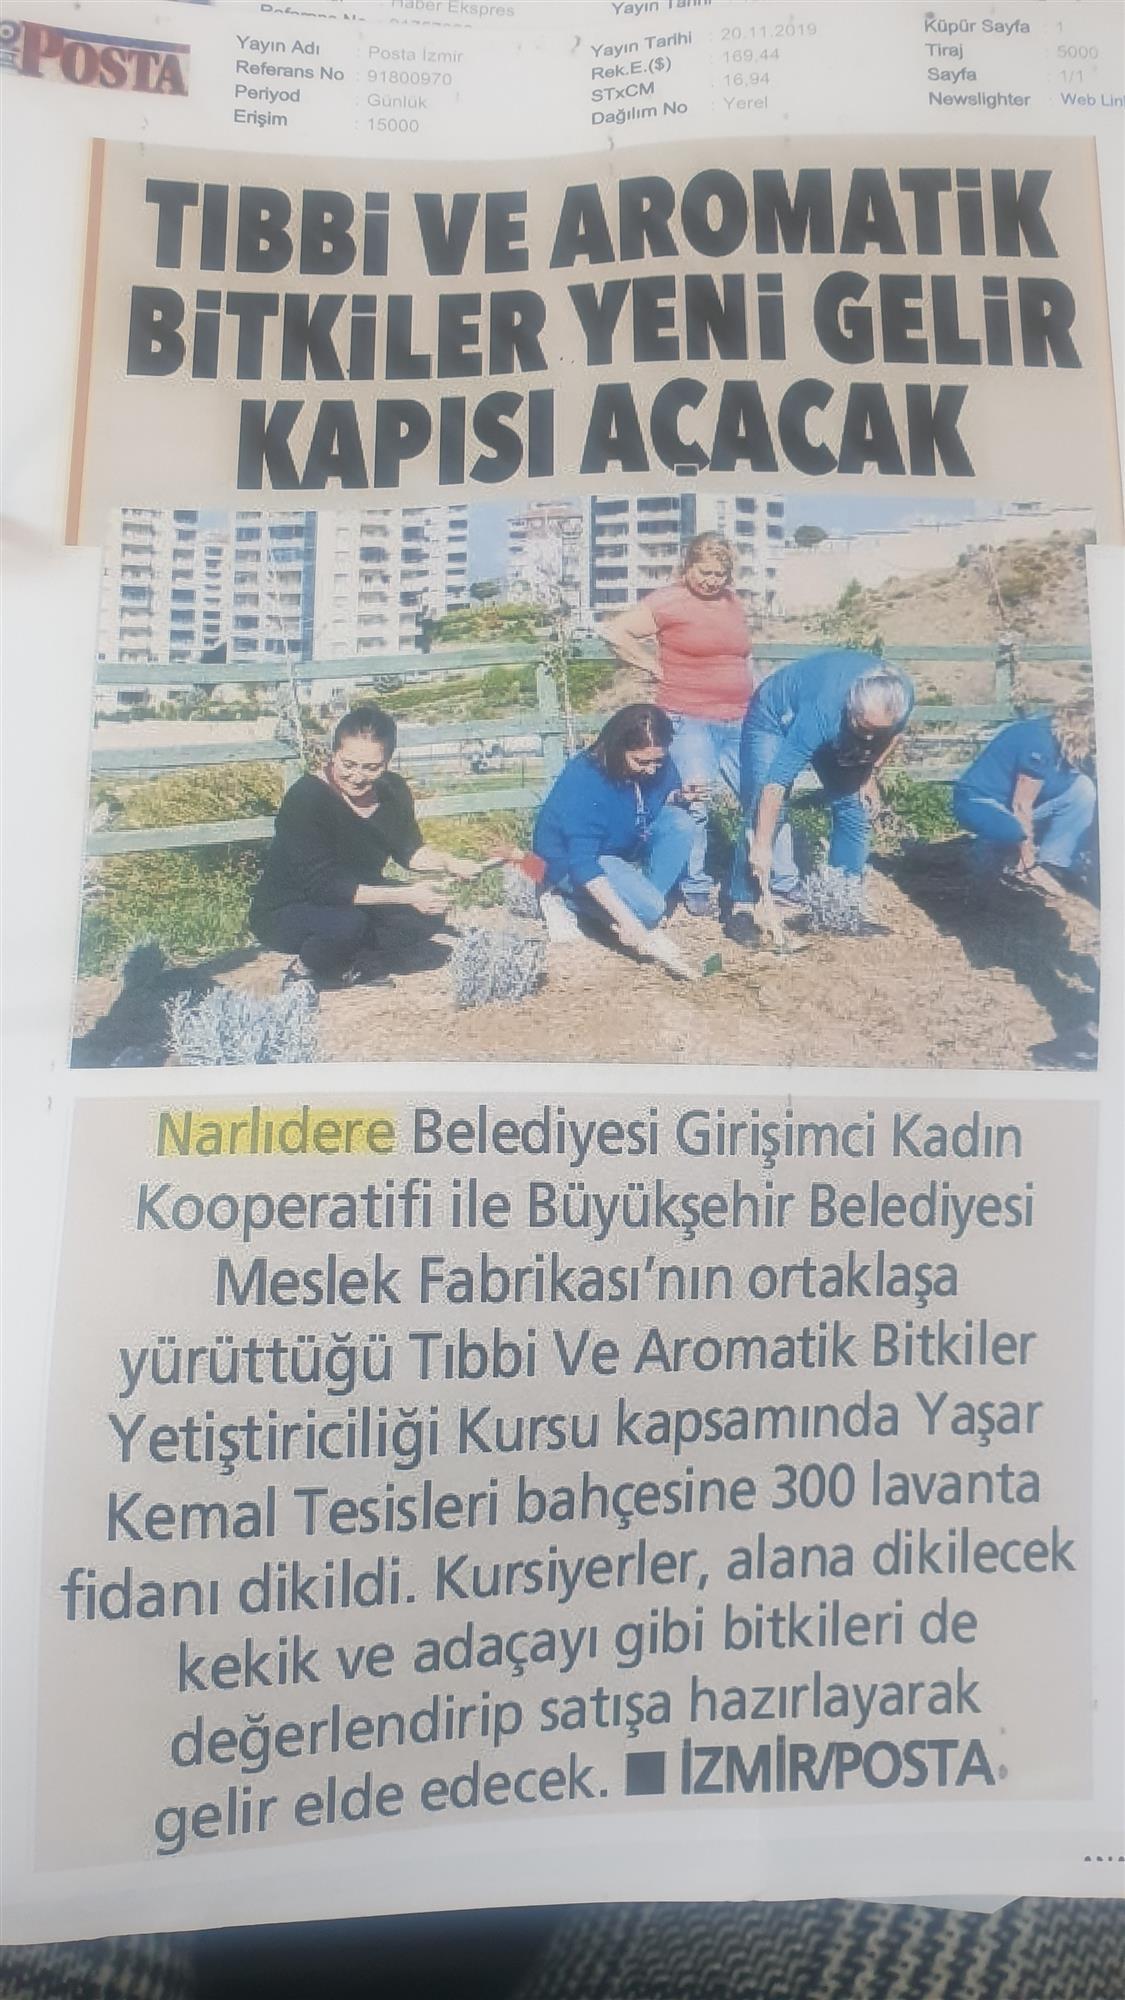 gazete-haberleri202012816740306